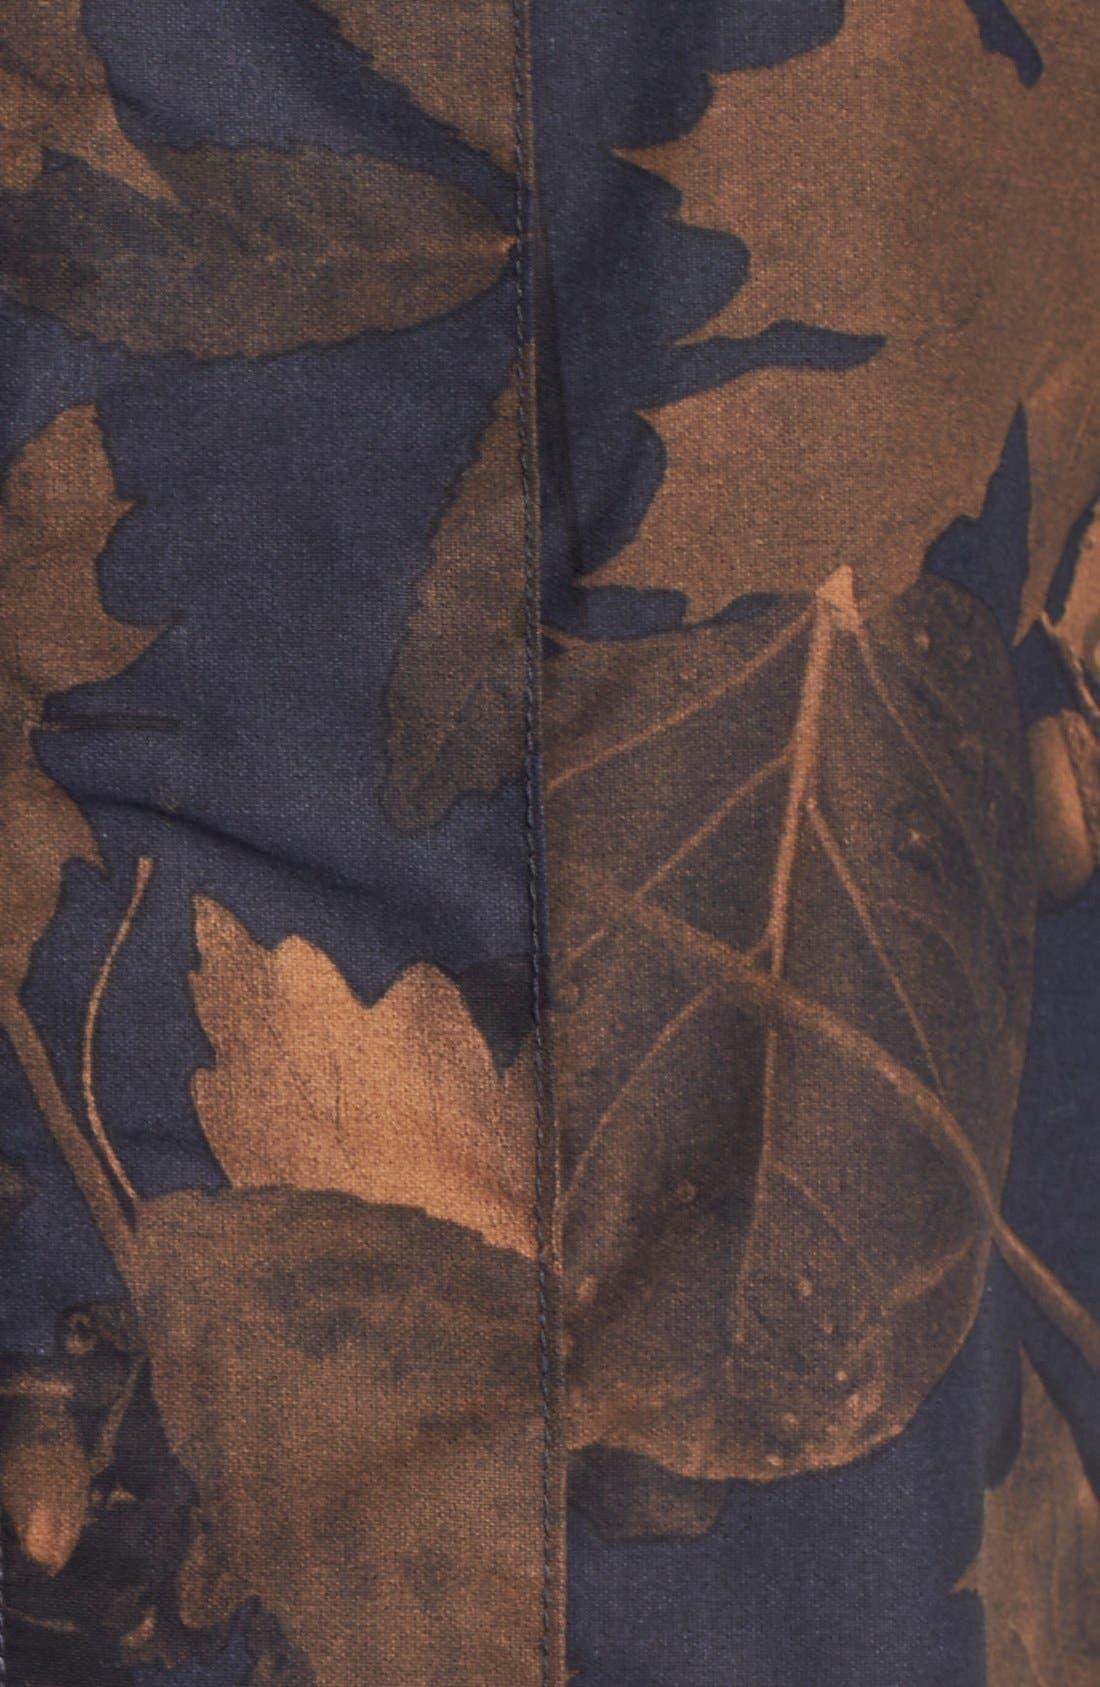 Originals Leaf Camouflage Print Parka,                             Alternate thumbnail 2, color,                             001